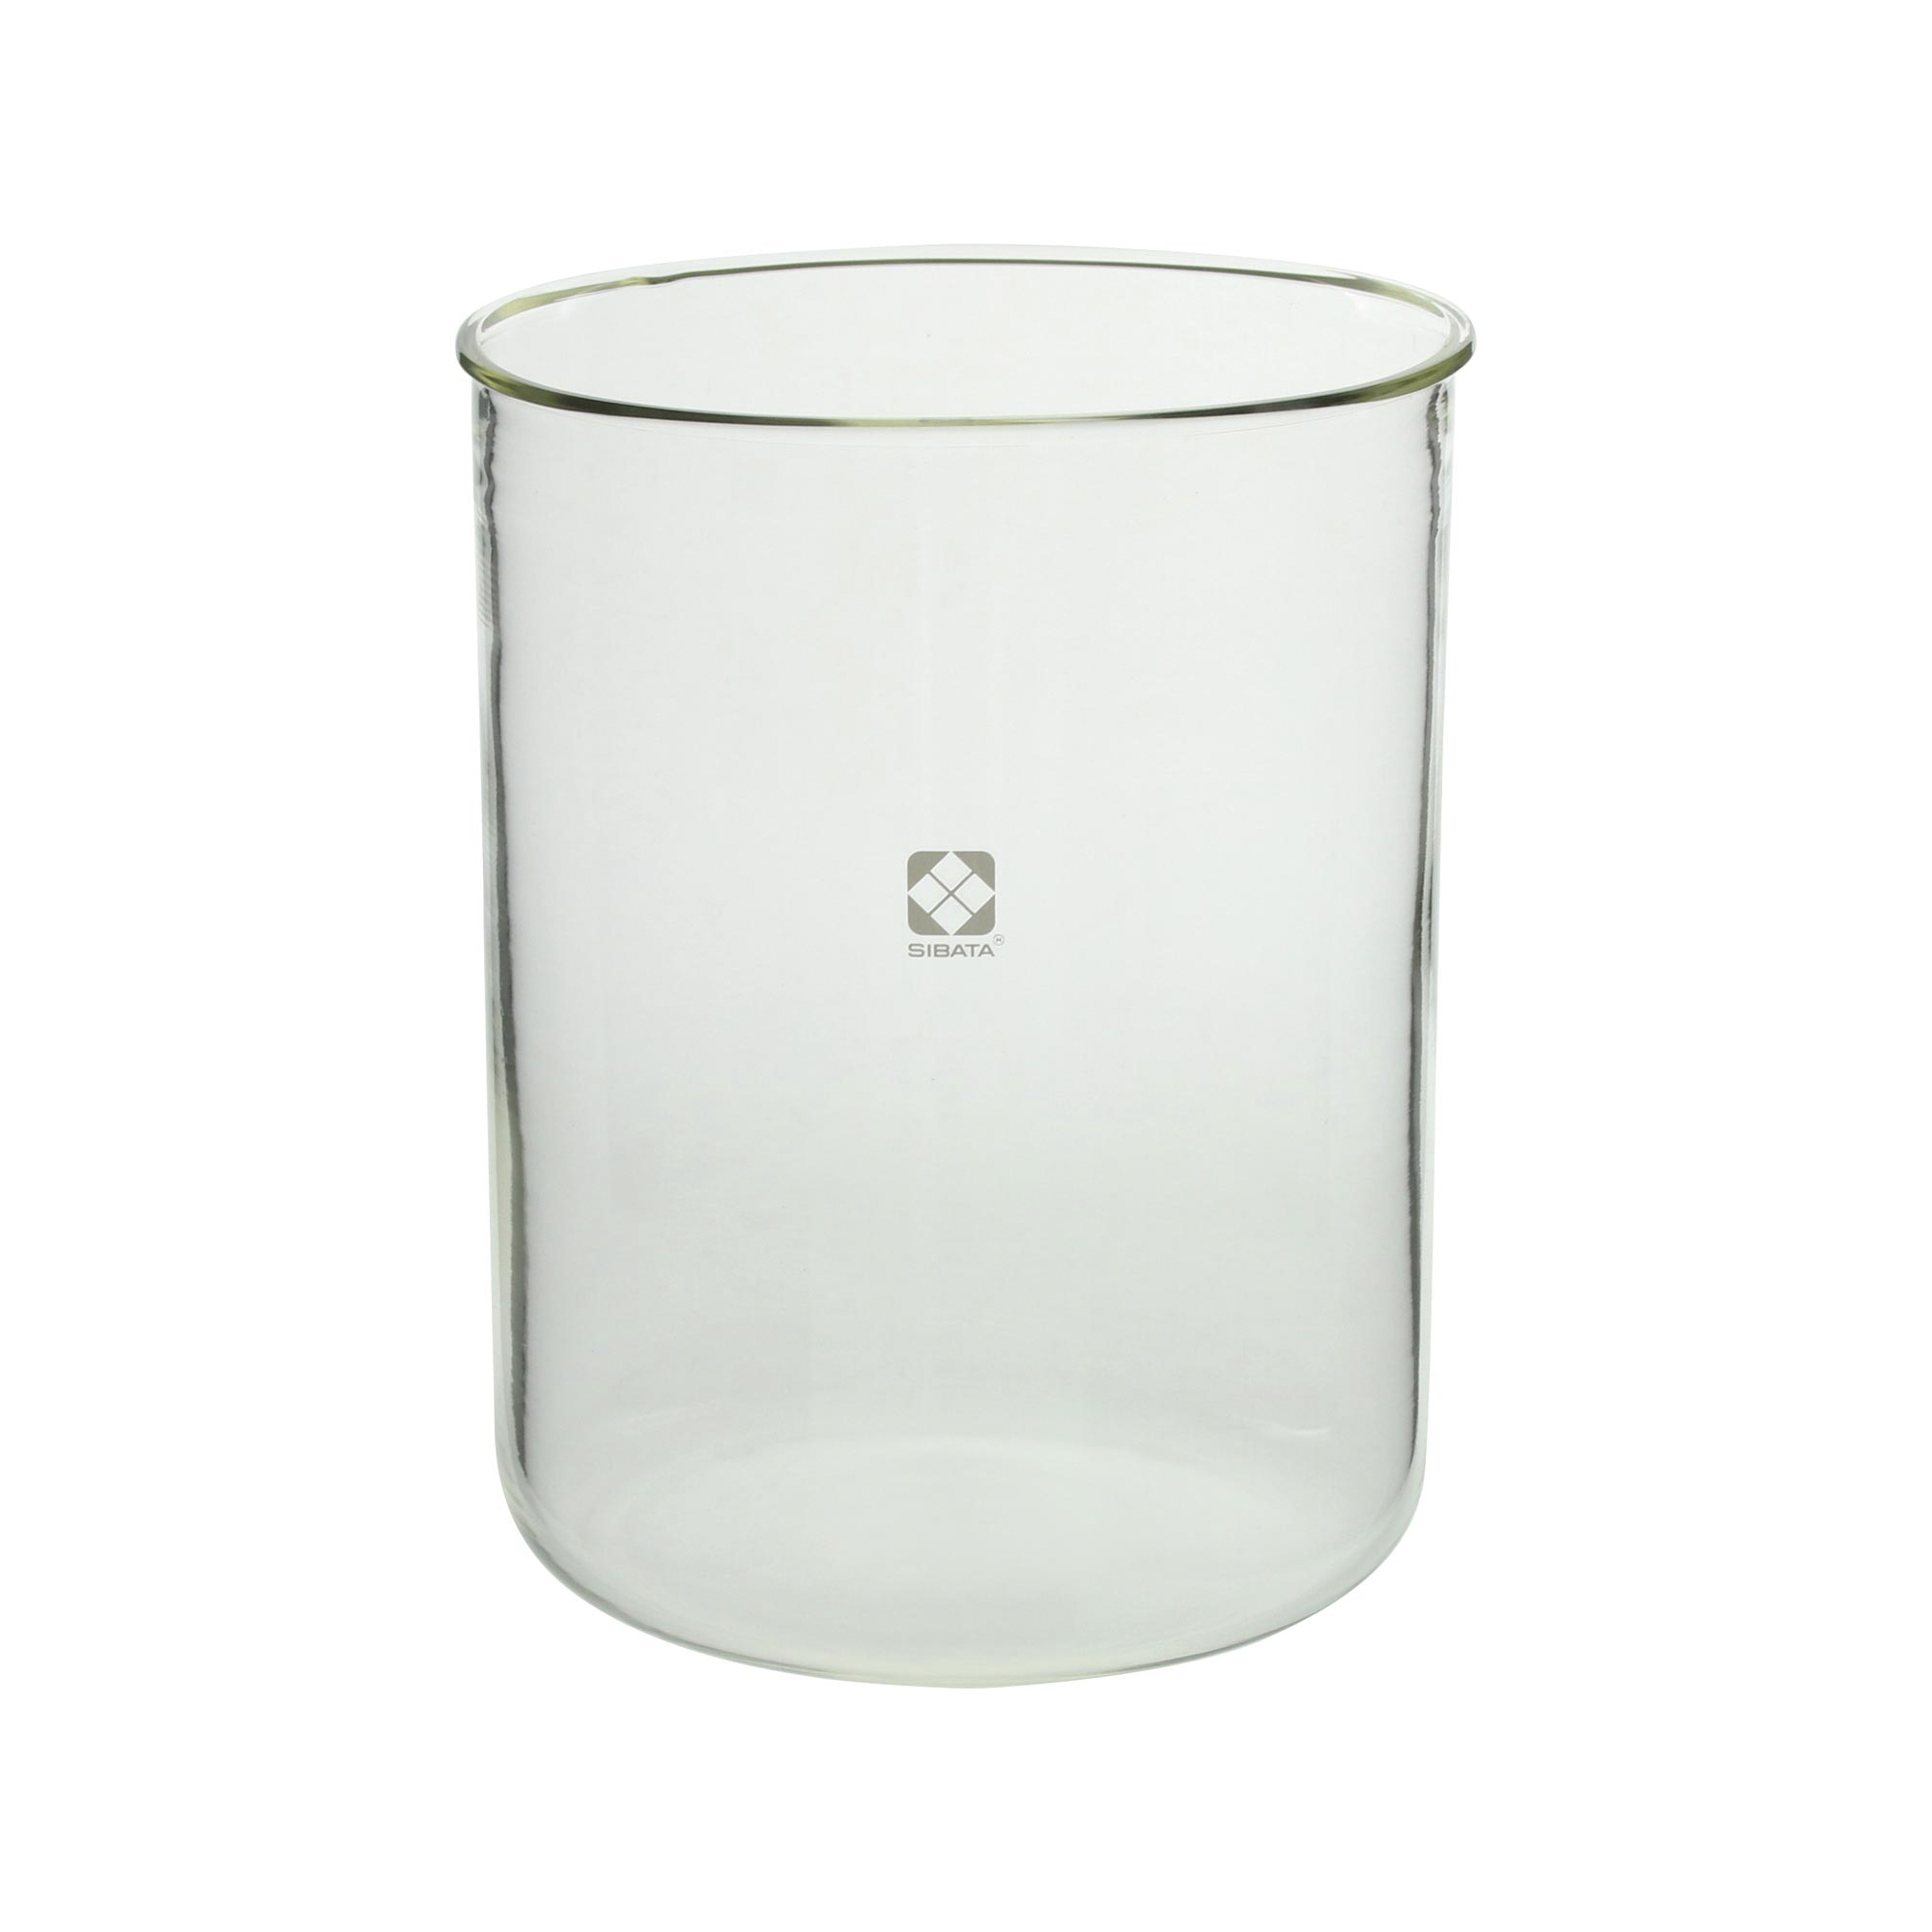 φ165mmガラス円筒 ダストジャーH型用